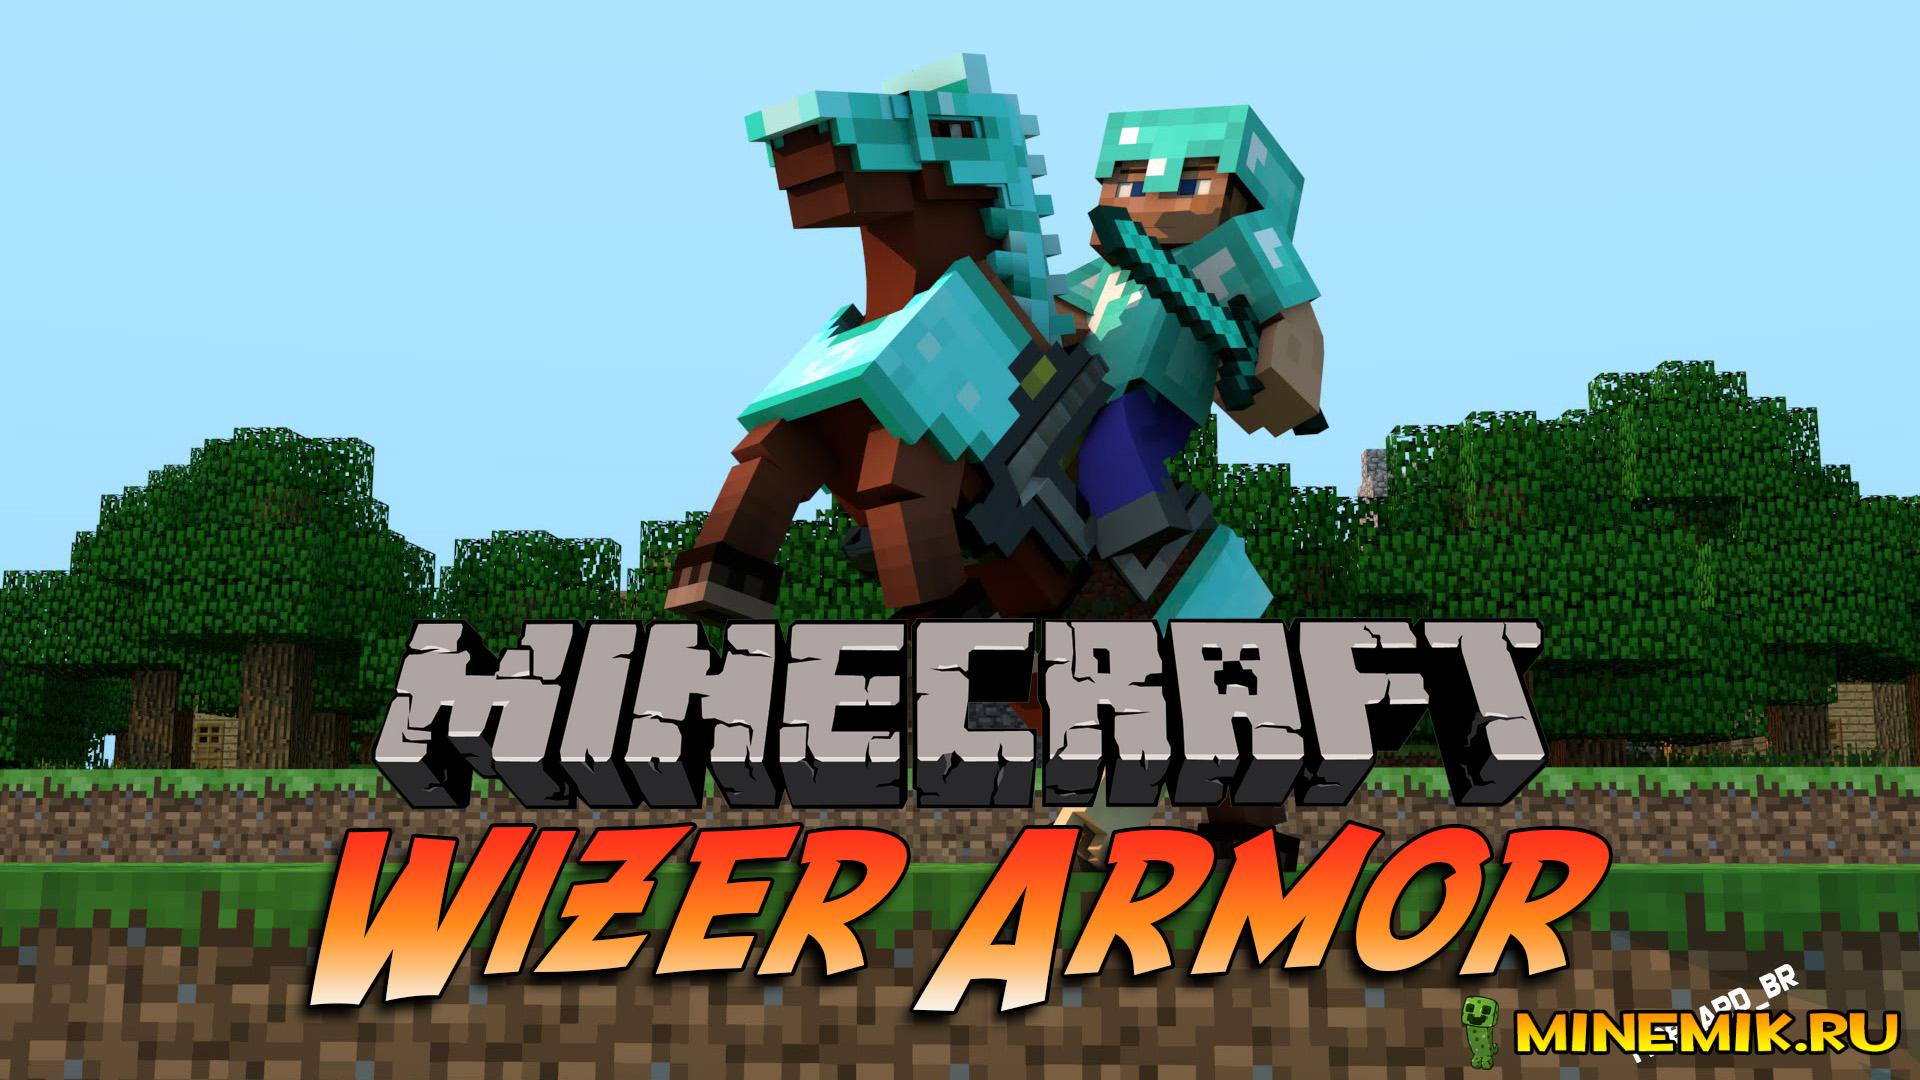 Мод Wizer Armor для minecraft PE